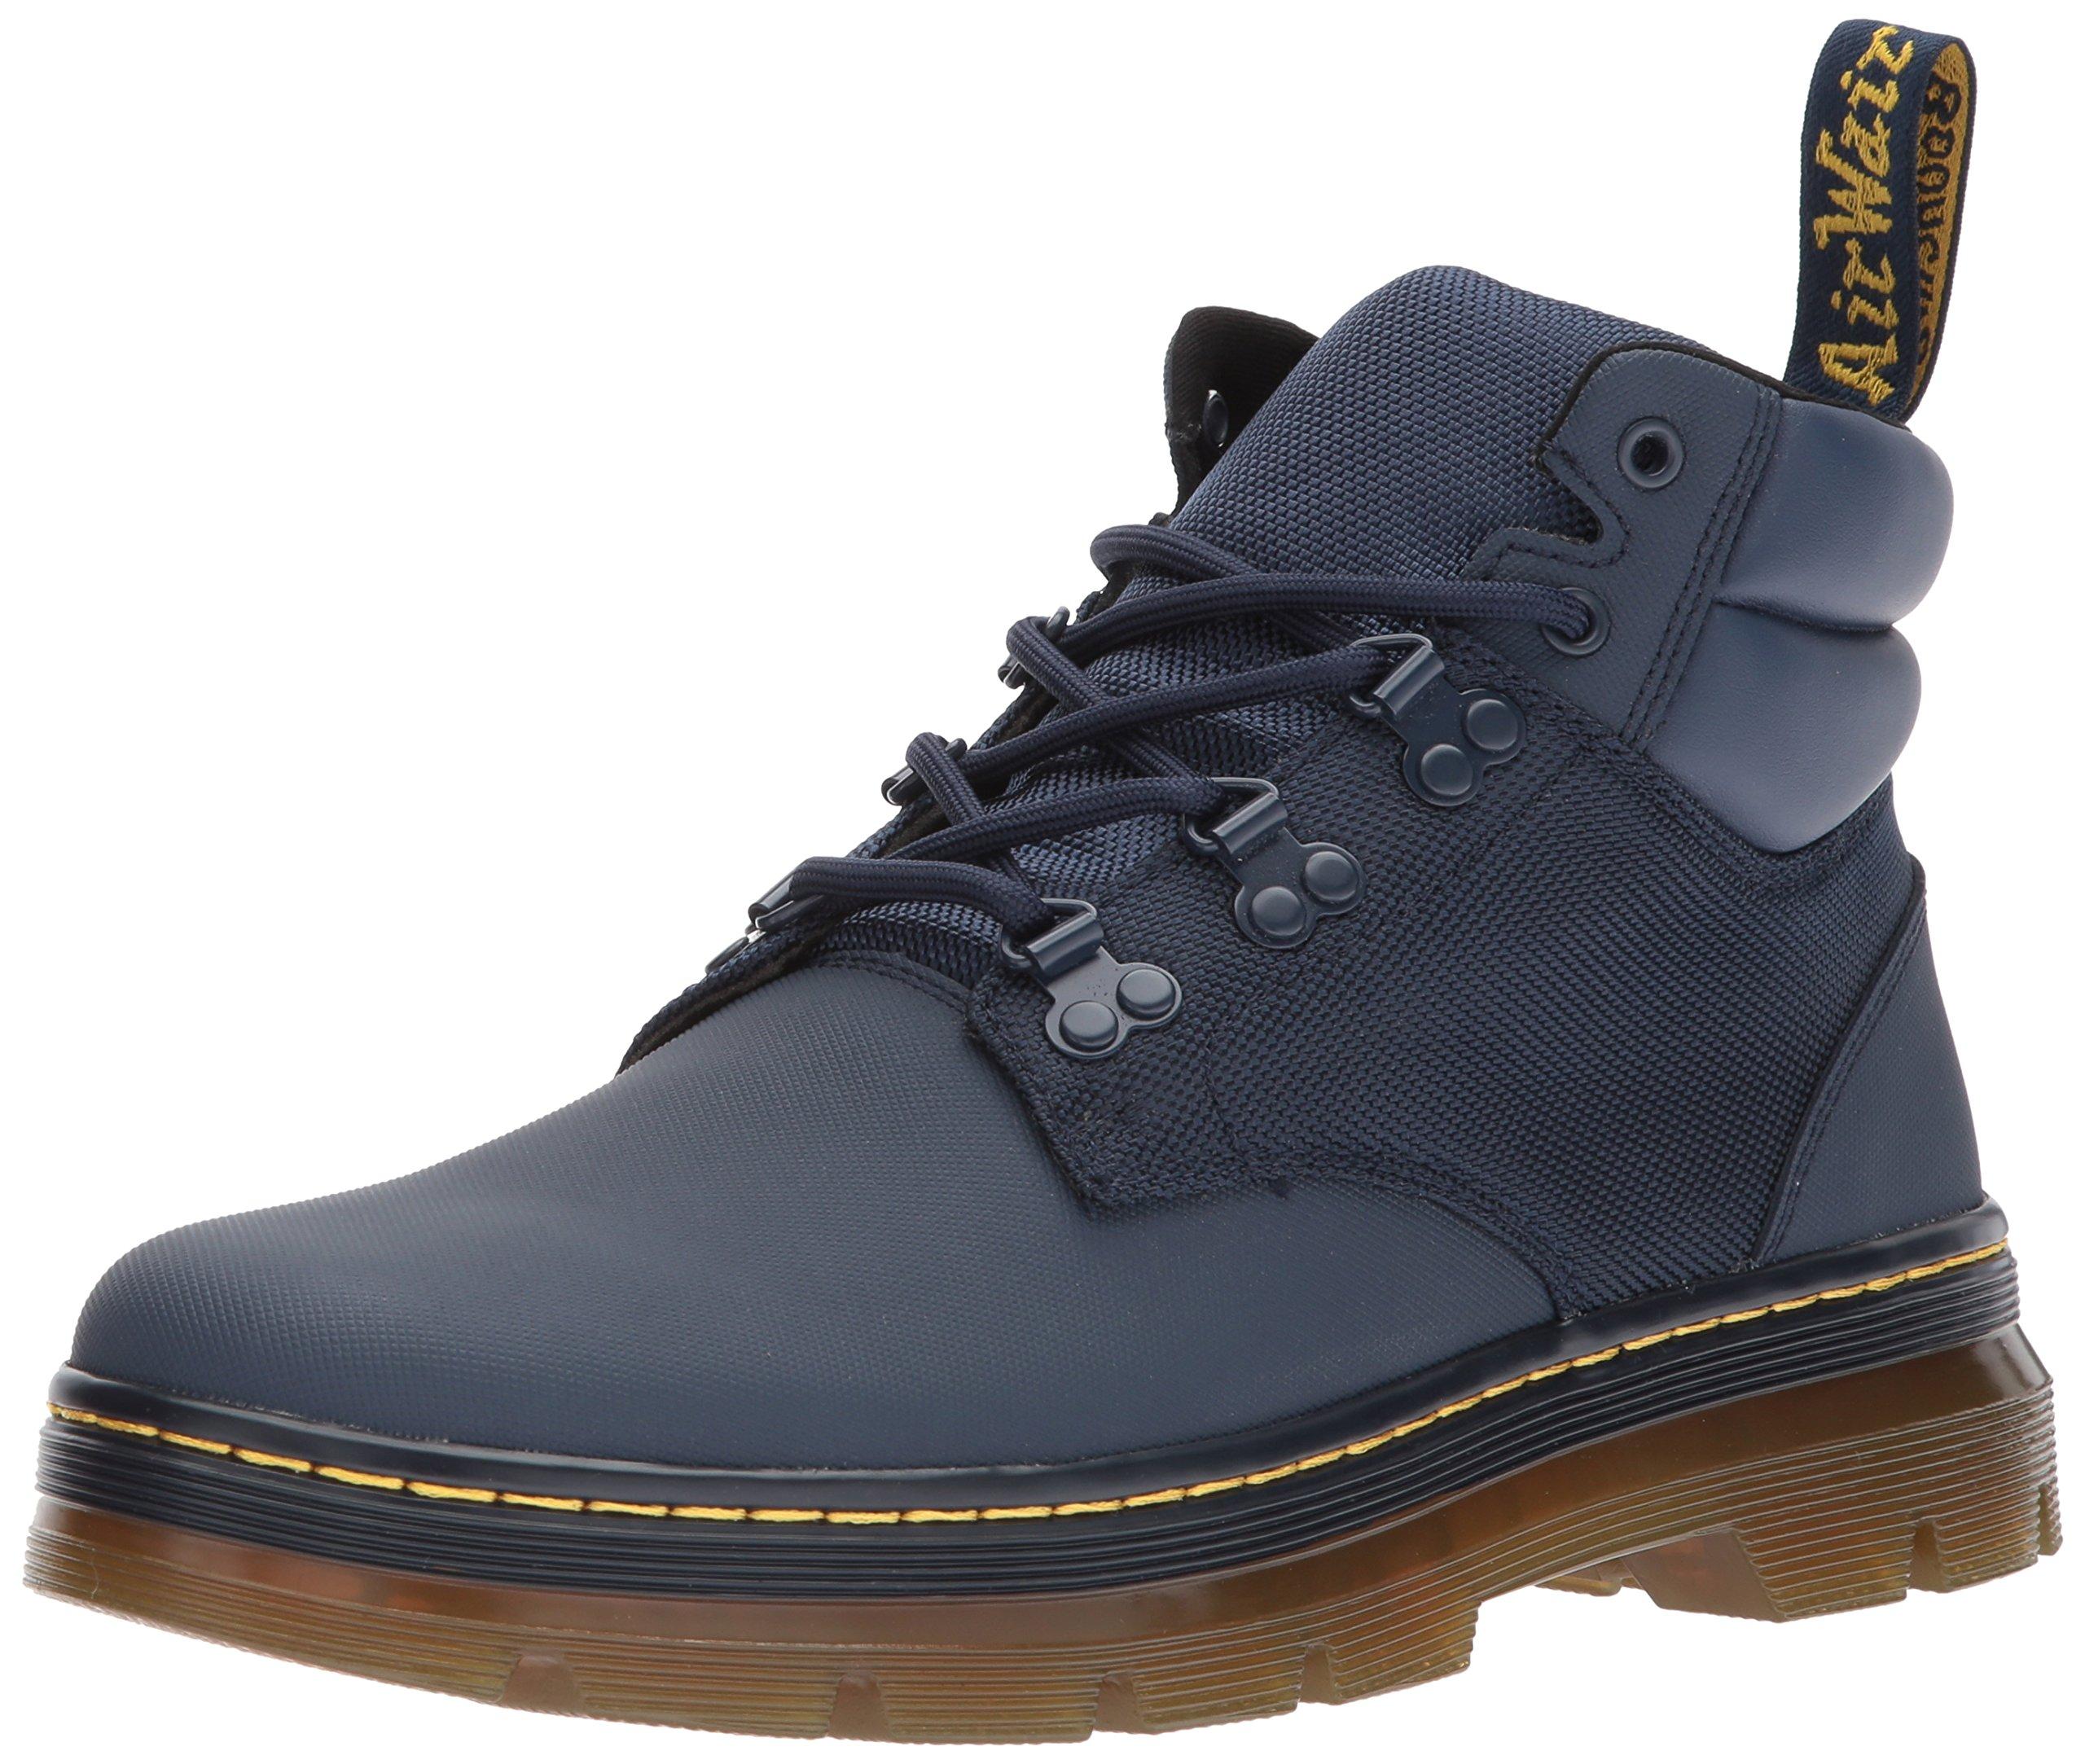 Dr. Martens Rakim Ankle Boot, Indigo, 7 Medium UK (US Men's 8, Women's 9 US)